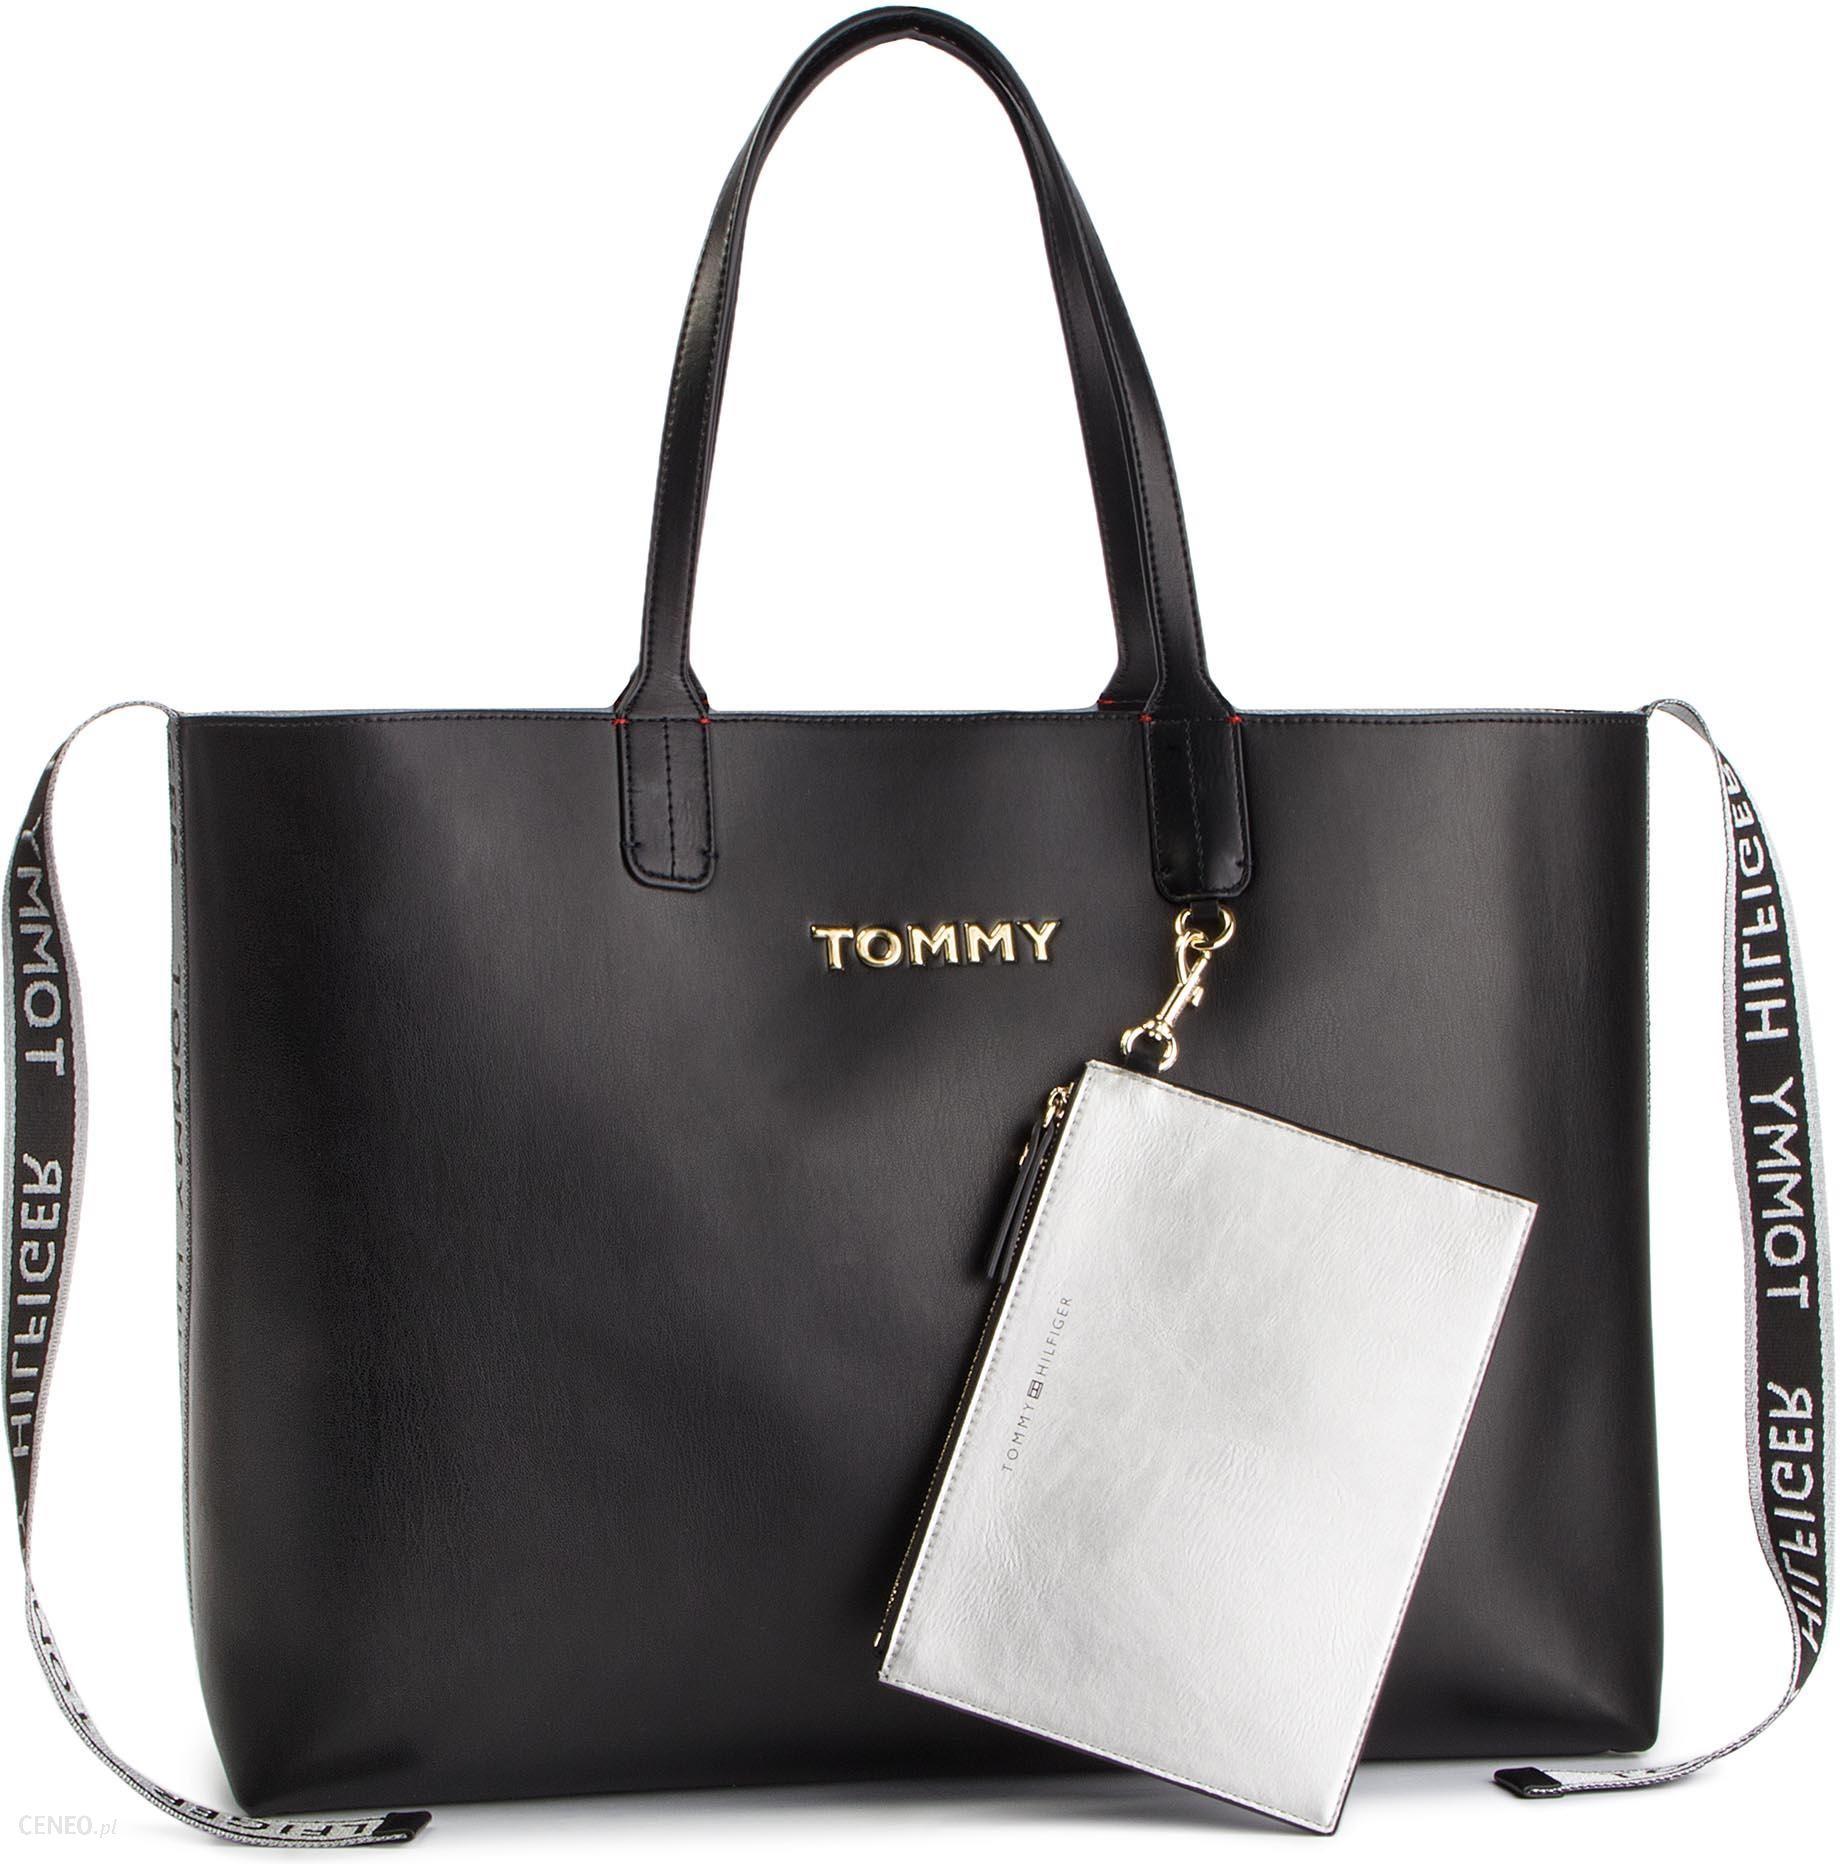 f6f693746 Torebka TOMMY HILFIGER - Iconic Tommy Tote AW0AW06446 002 - Ceny i ...